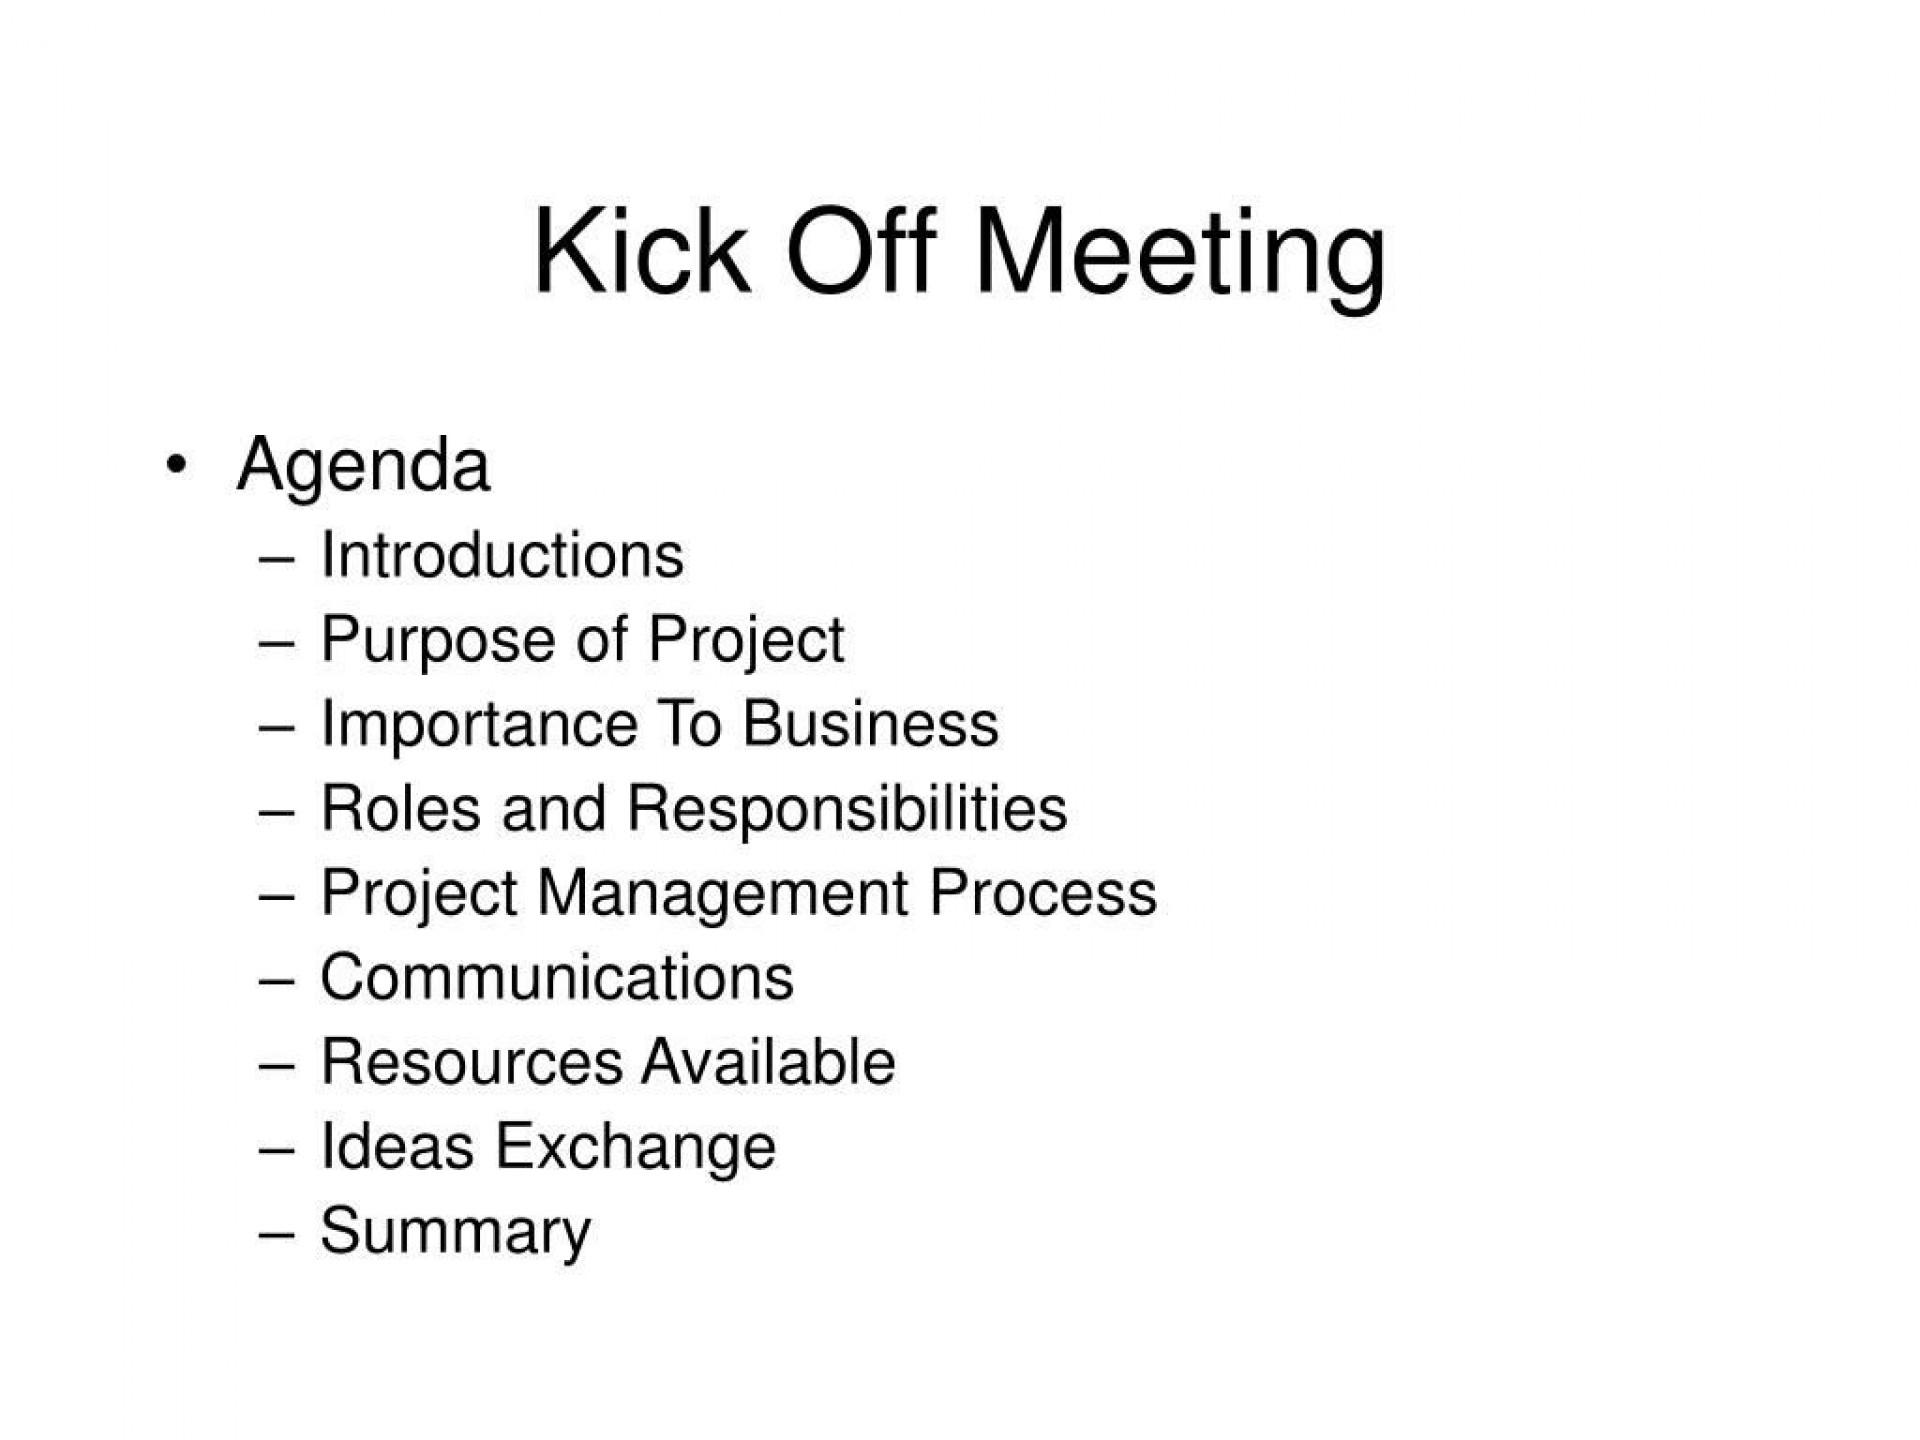 008 Unbelievable Project Management Kick Off Meeting Agenda Template Design  Kickoff1920